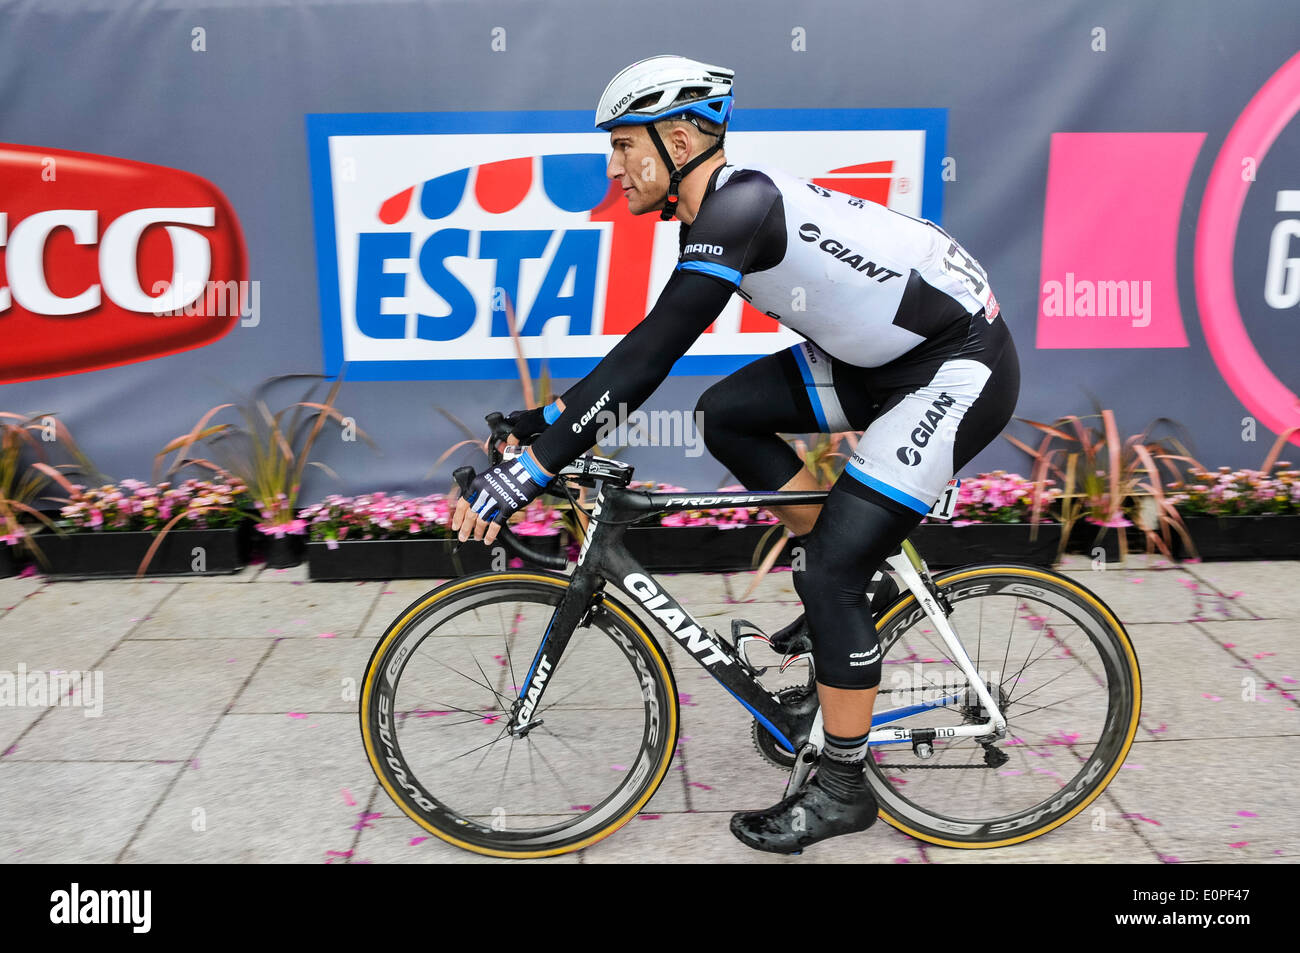 Belfast, Northern Ireland. 10 May 2014 - Marcel Kittel (Germany, Team Giant Shimano) riding his bike - Stock Image